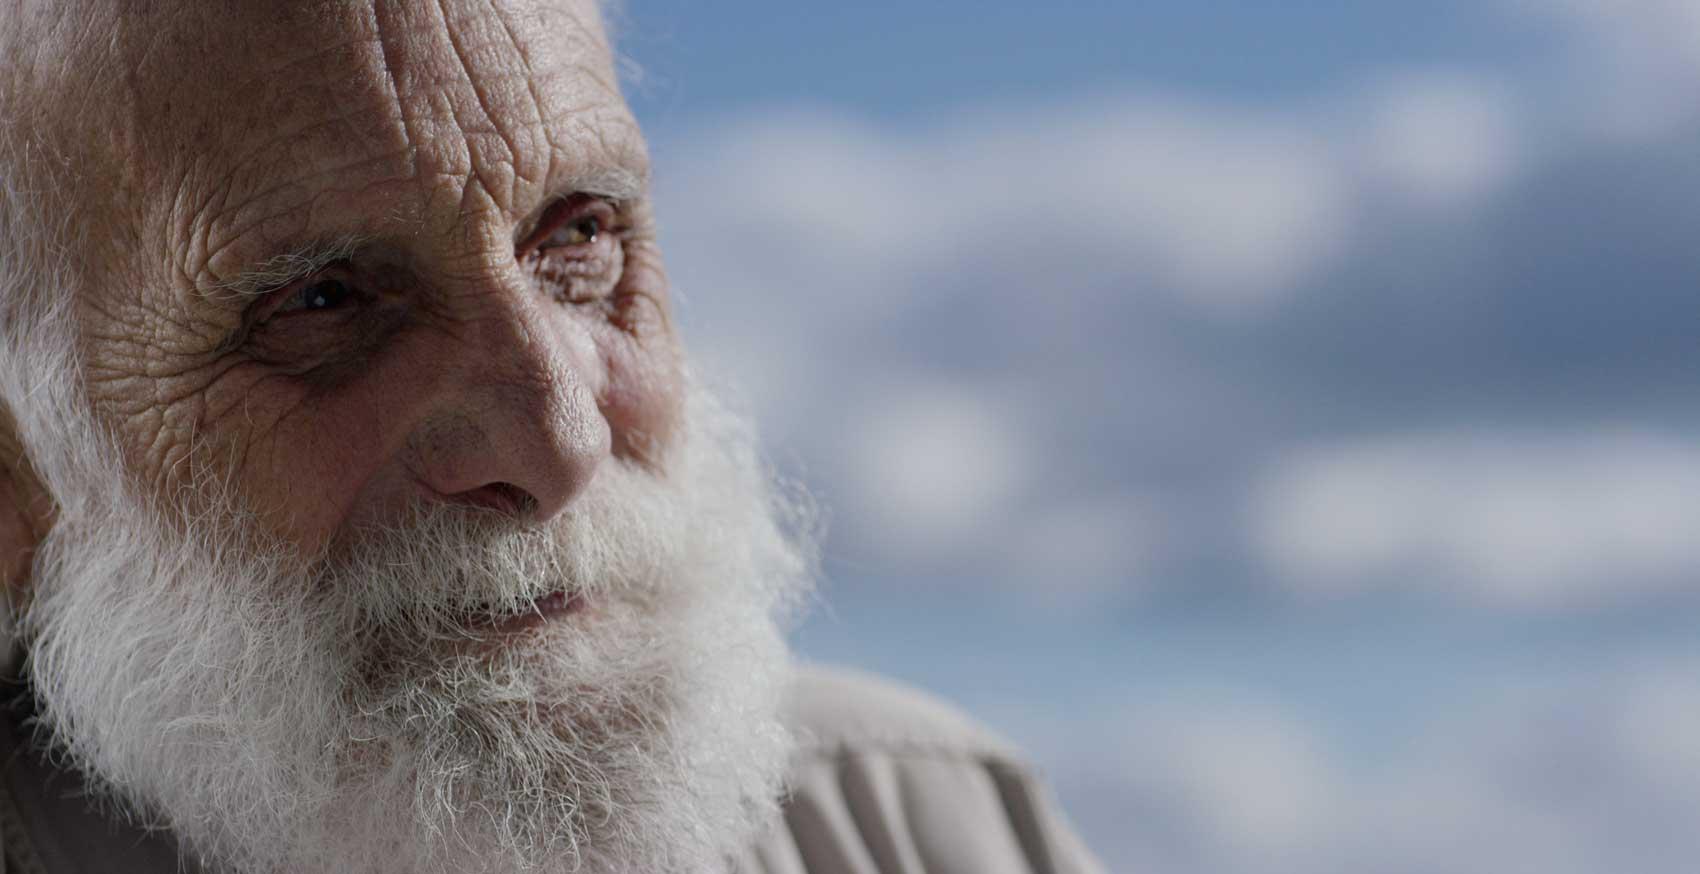 On the Mountain - Emmy-Winning Documentary